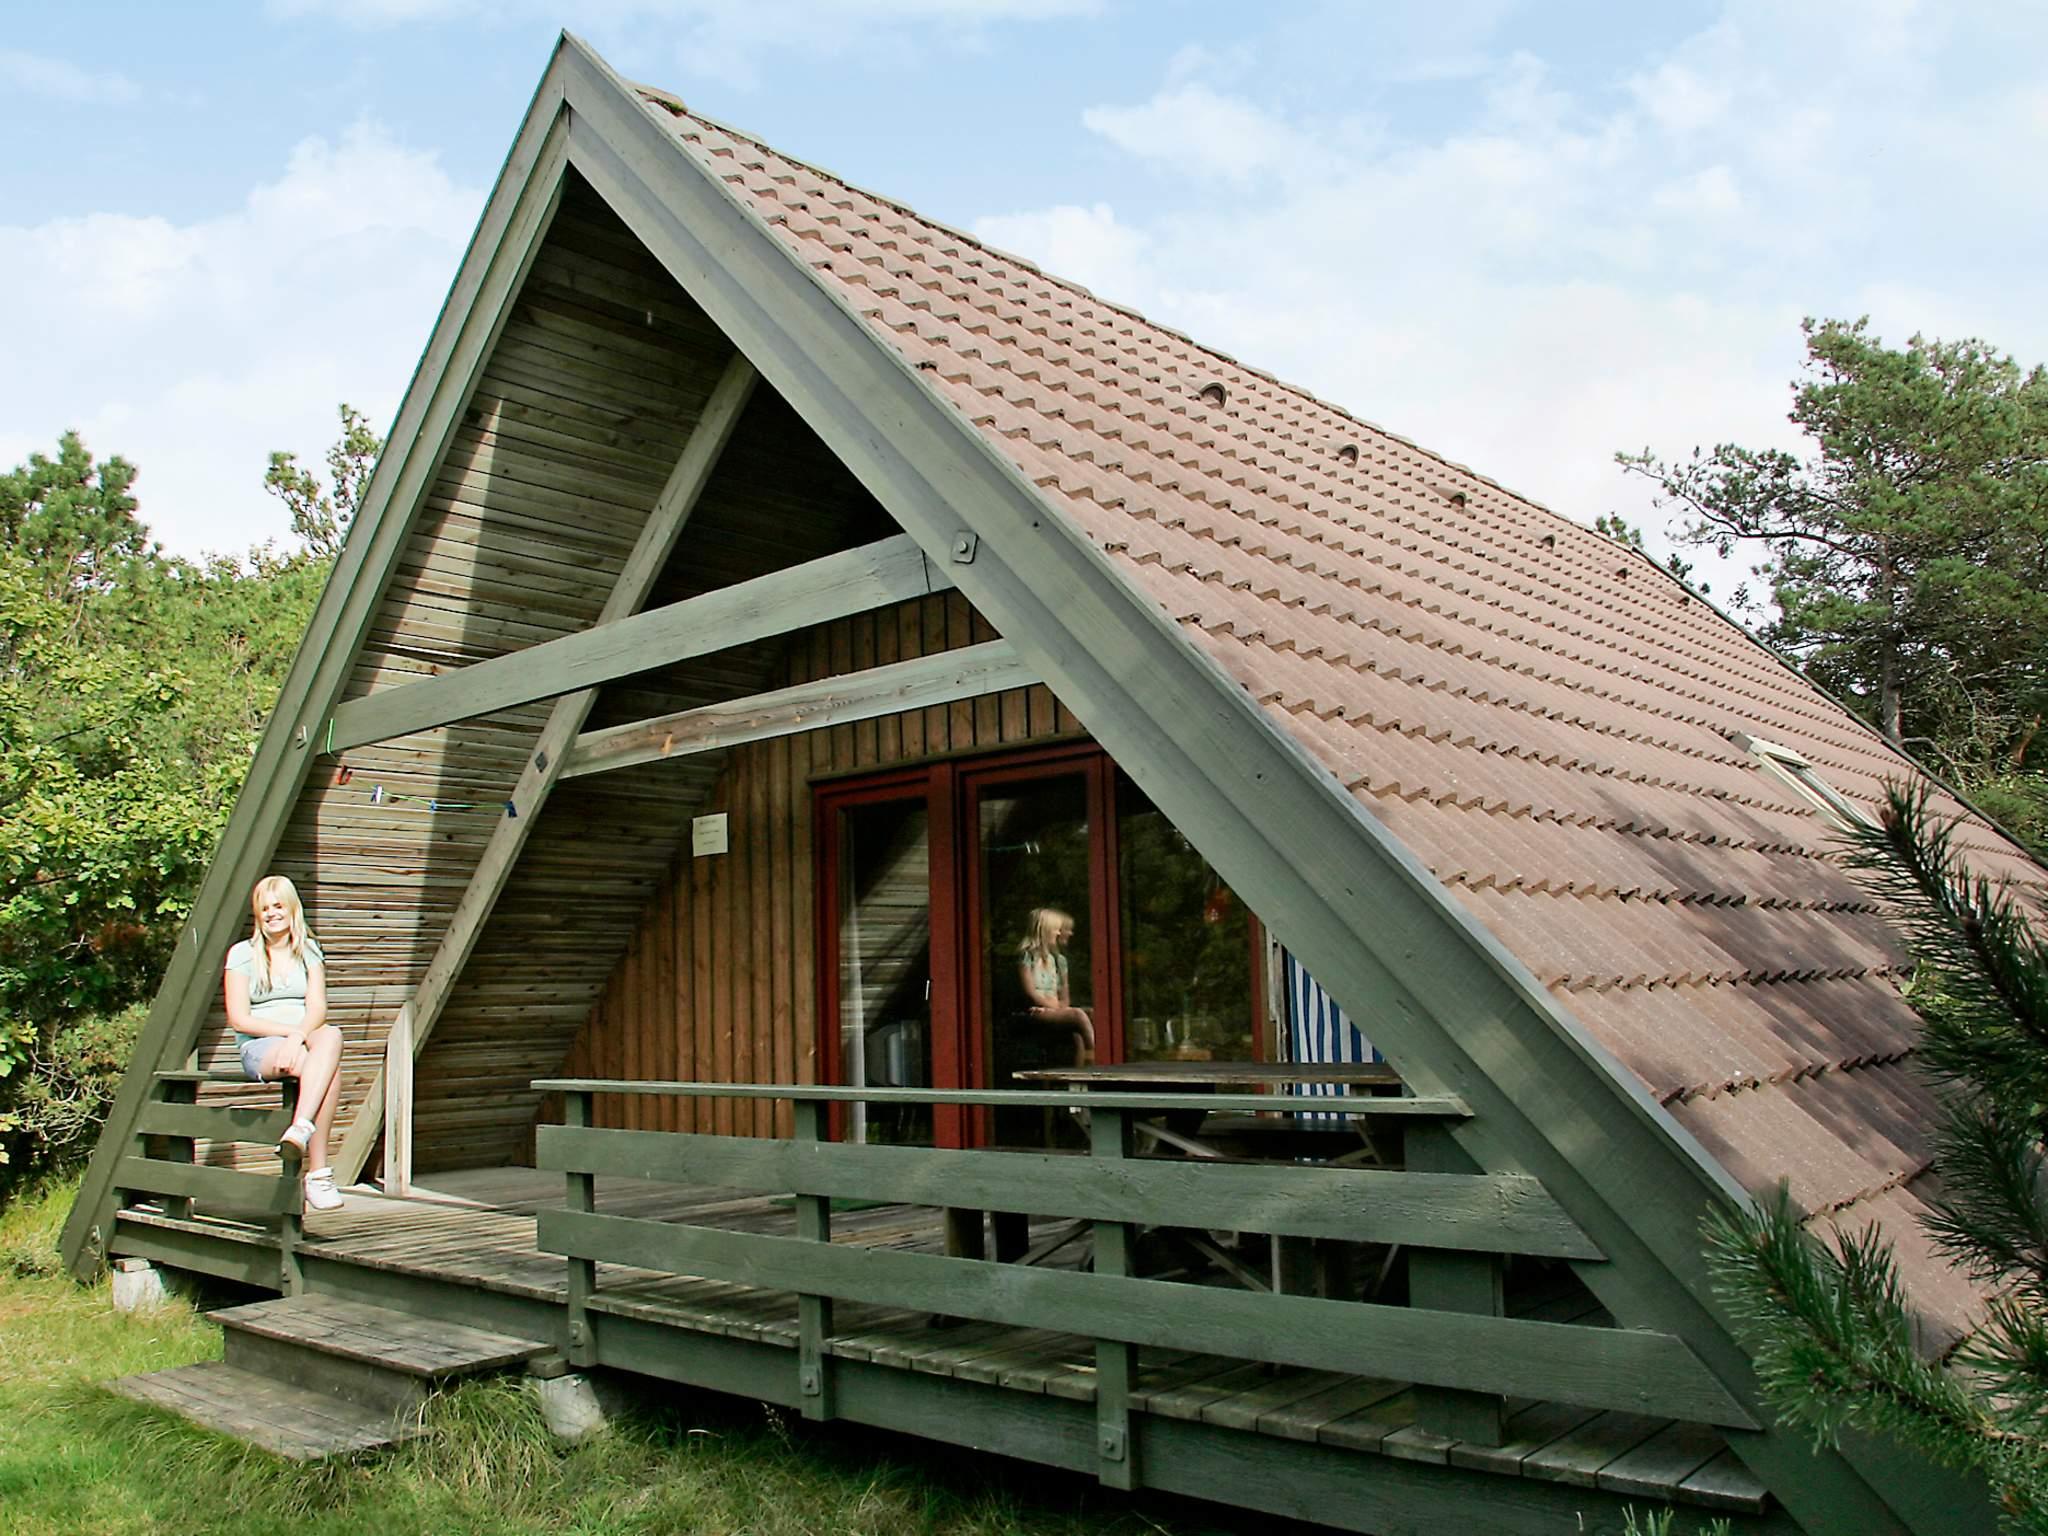 Ferienhaus Læsø/Vesterø (88181), Læsø, , Læsø, Dänemark, Bild 11